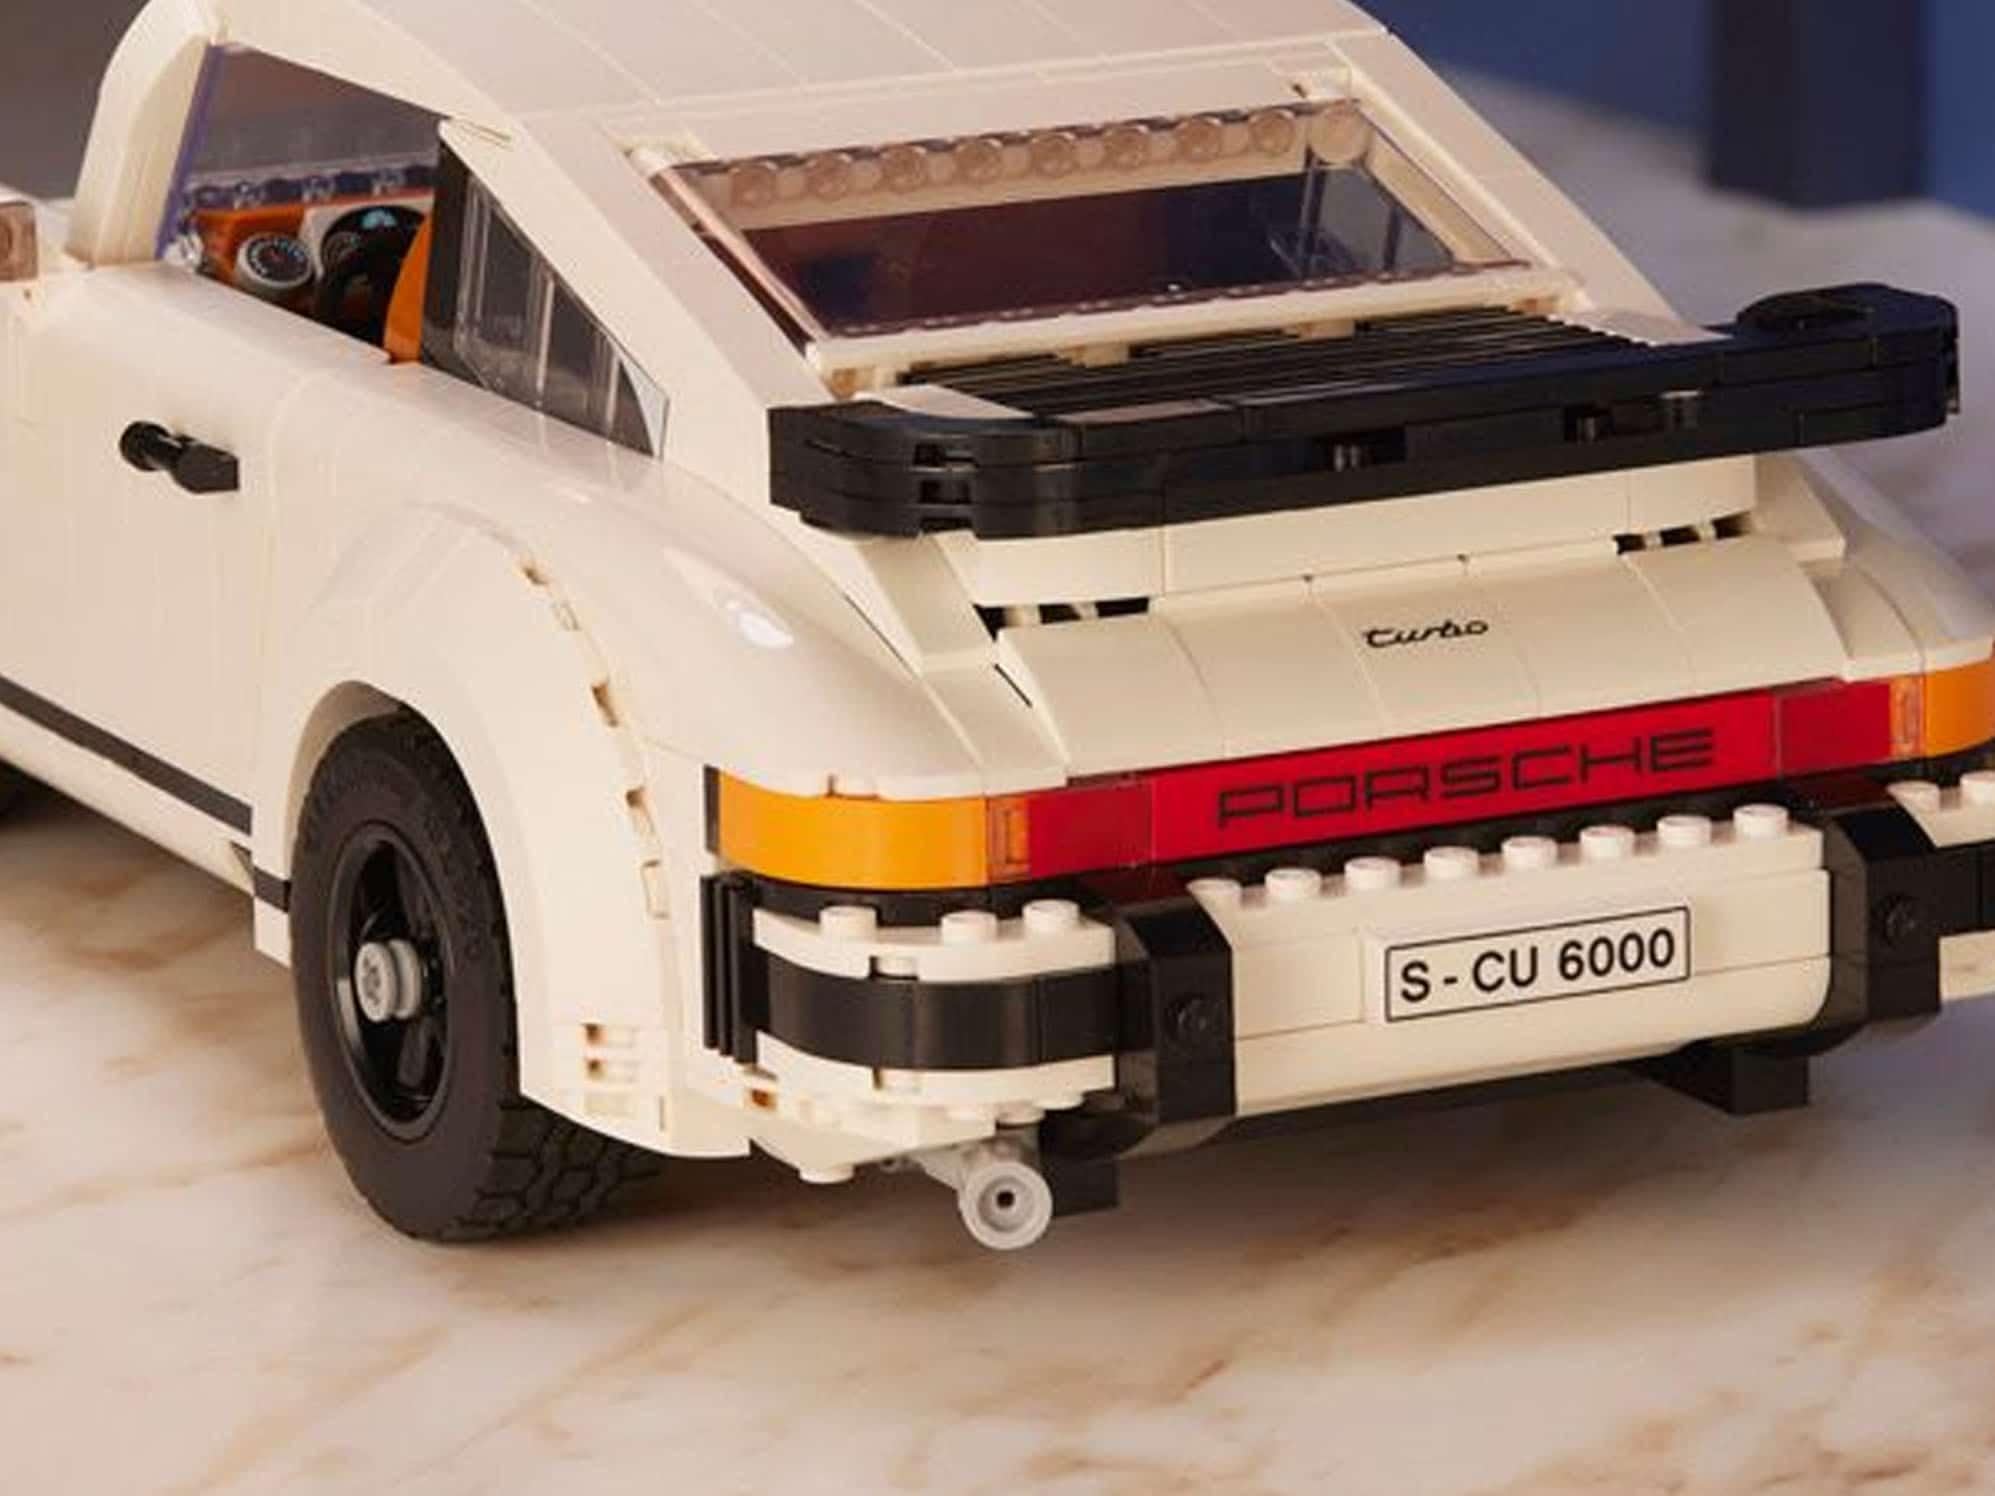 LEGO 10295 Porsche 911 Vergleichsbild LEGO